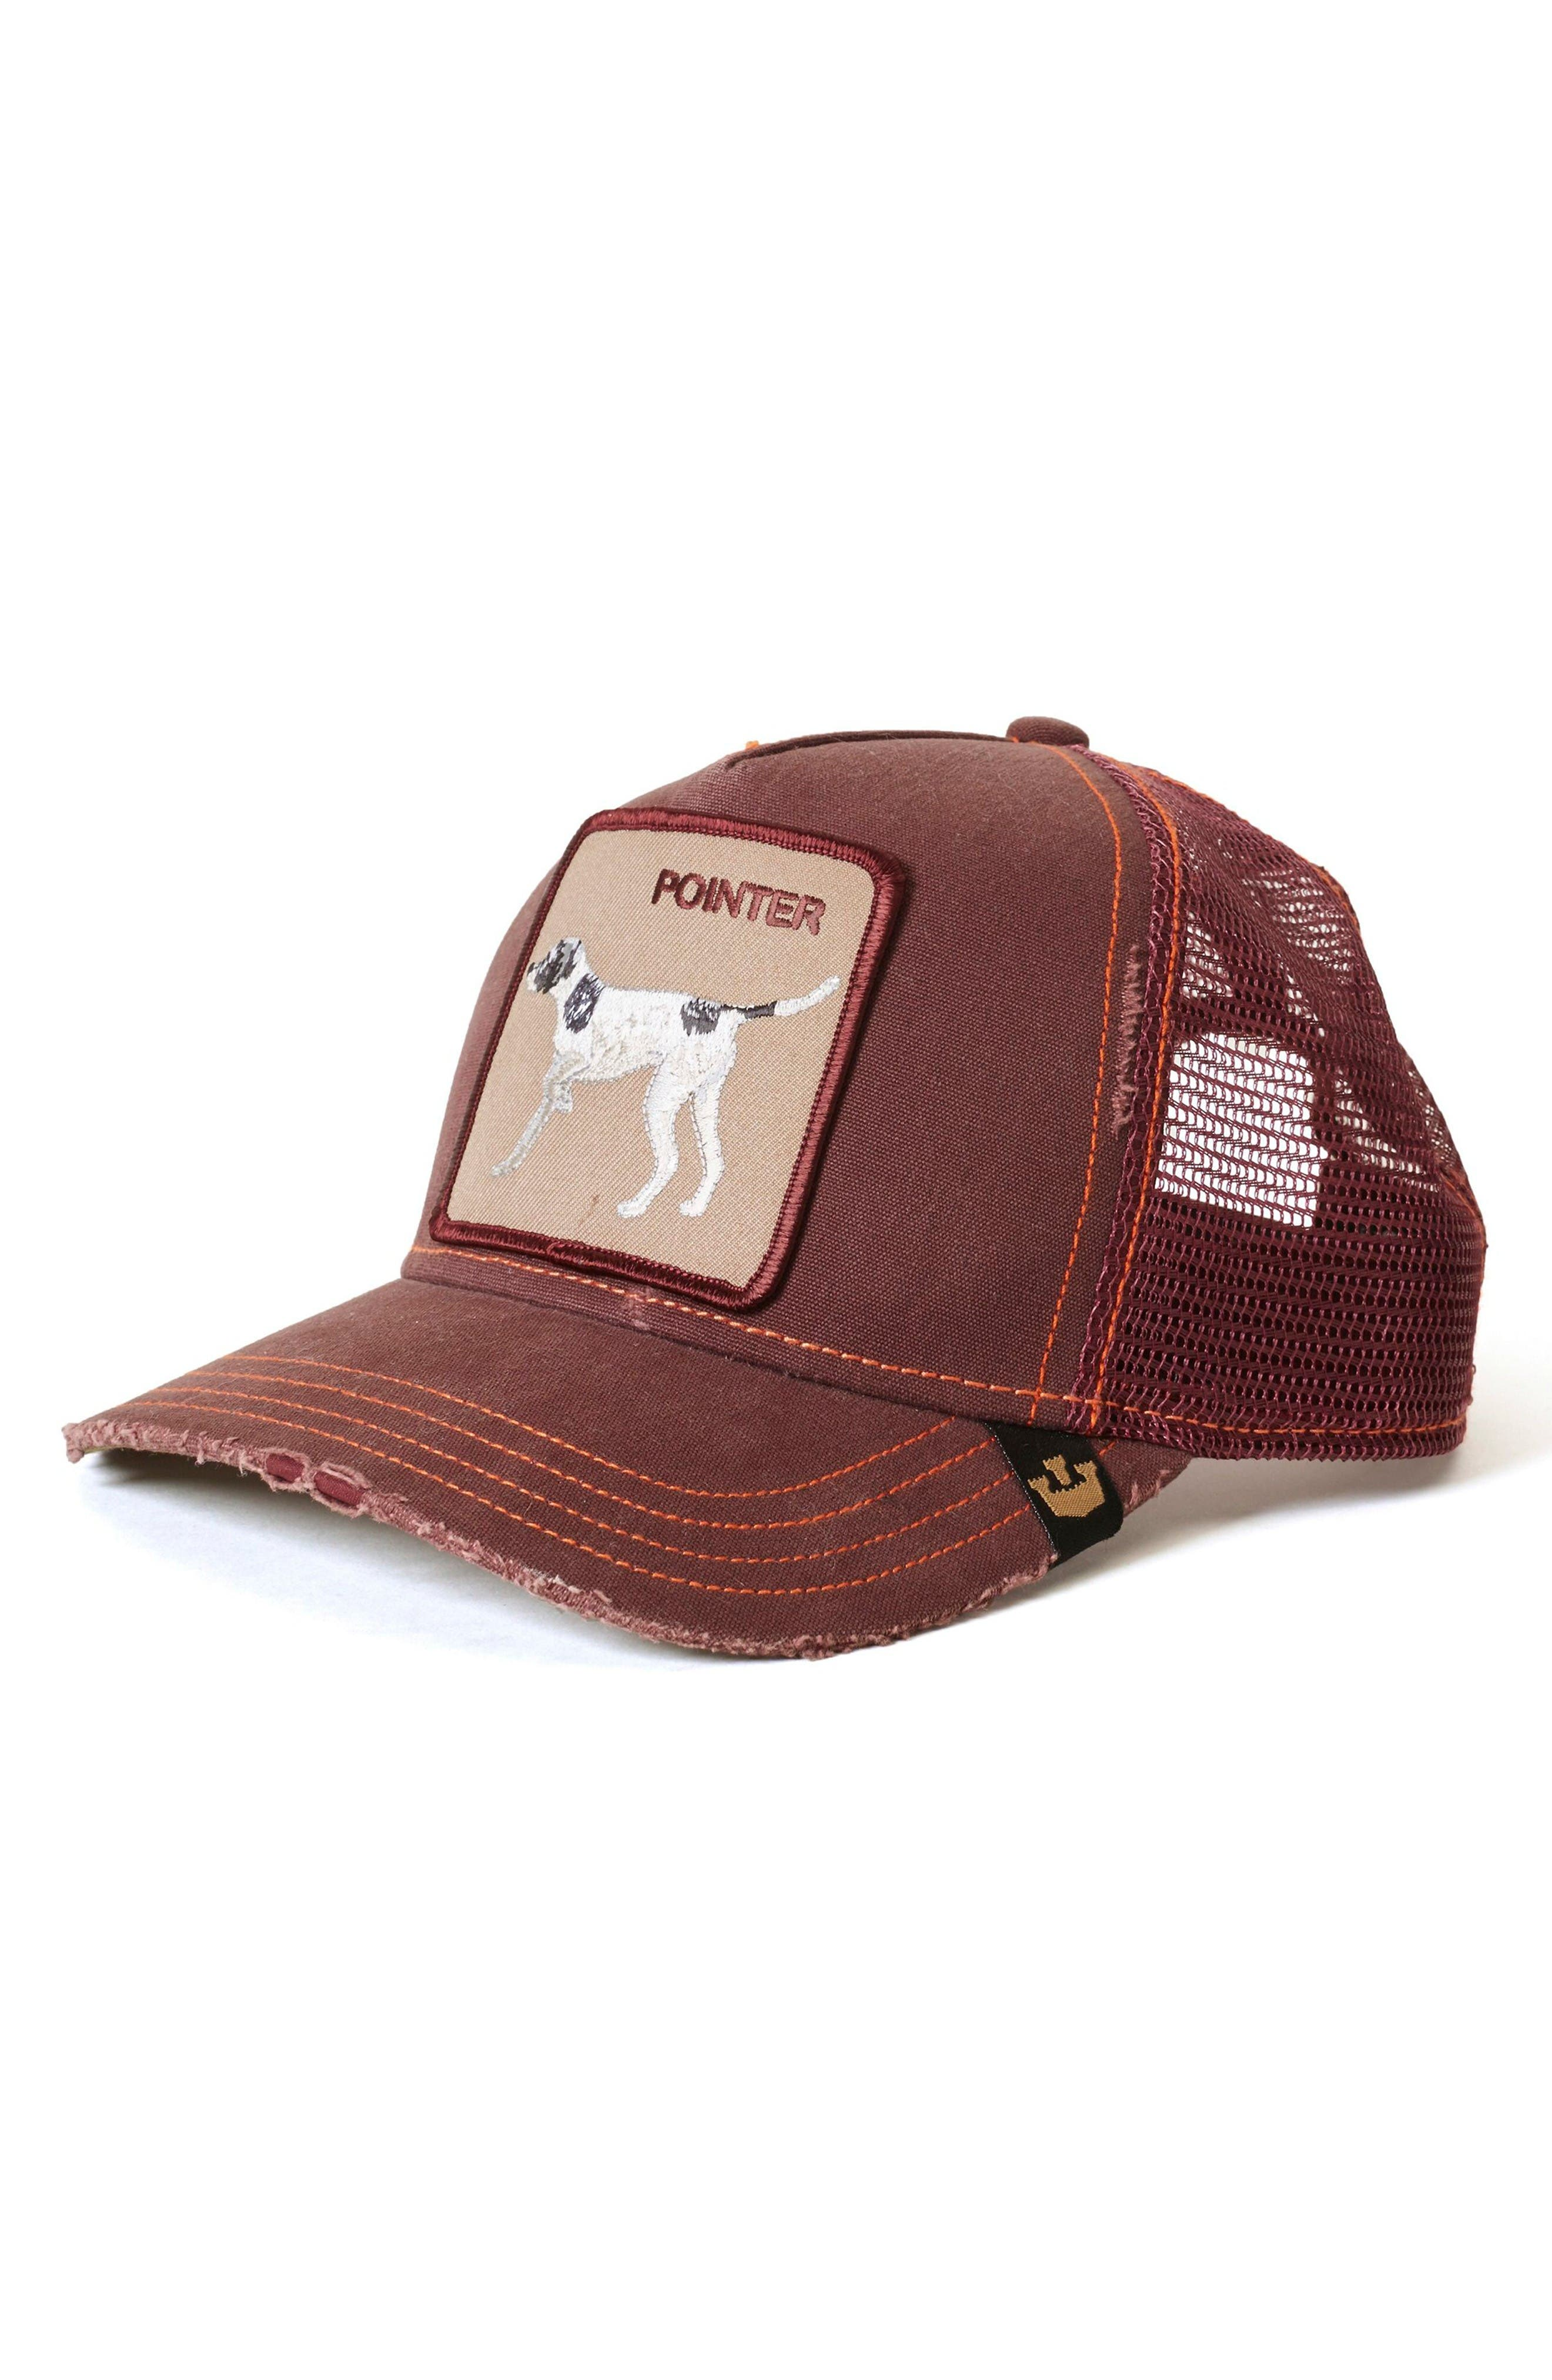 Goorin Brothers The Pointer Trucker Hat